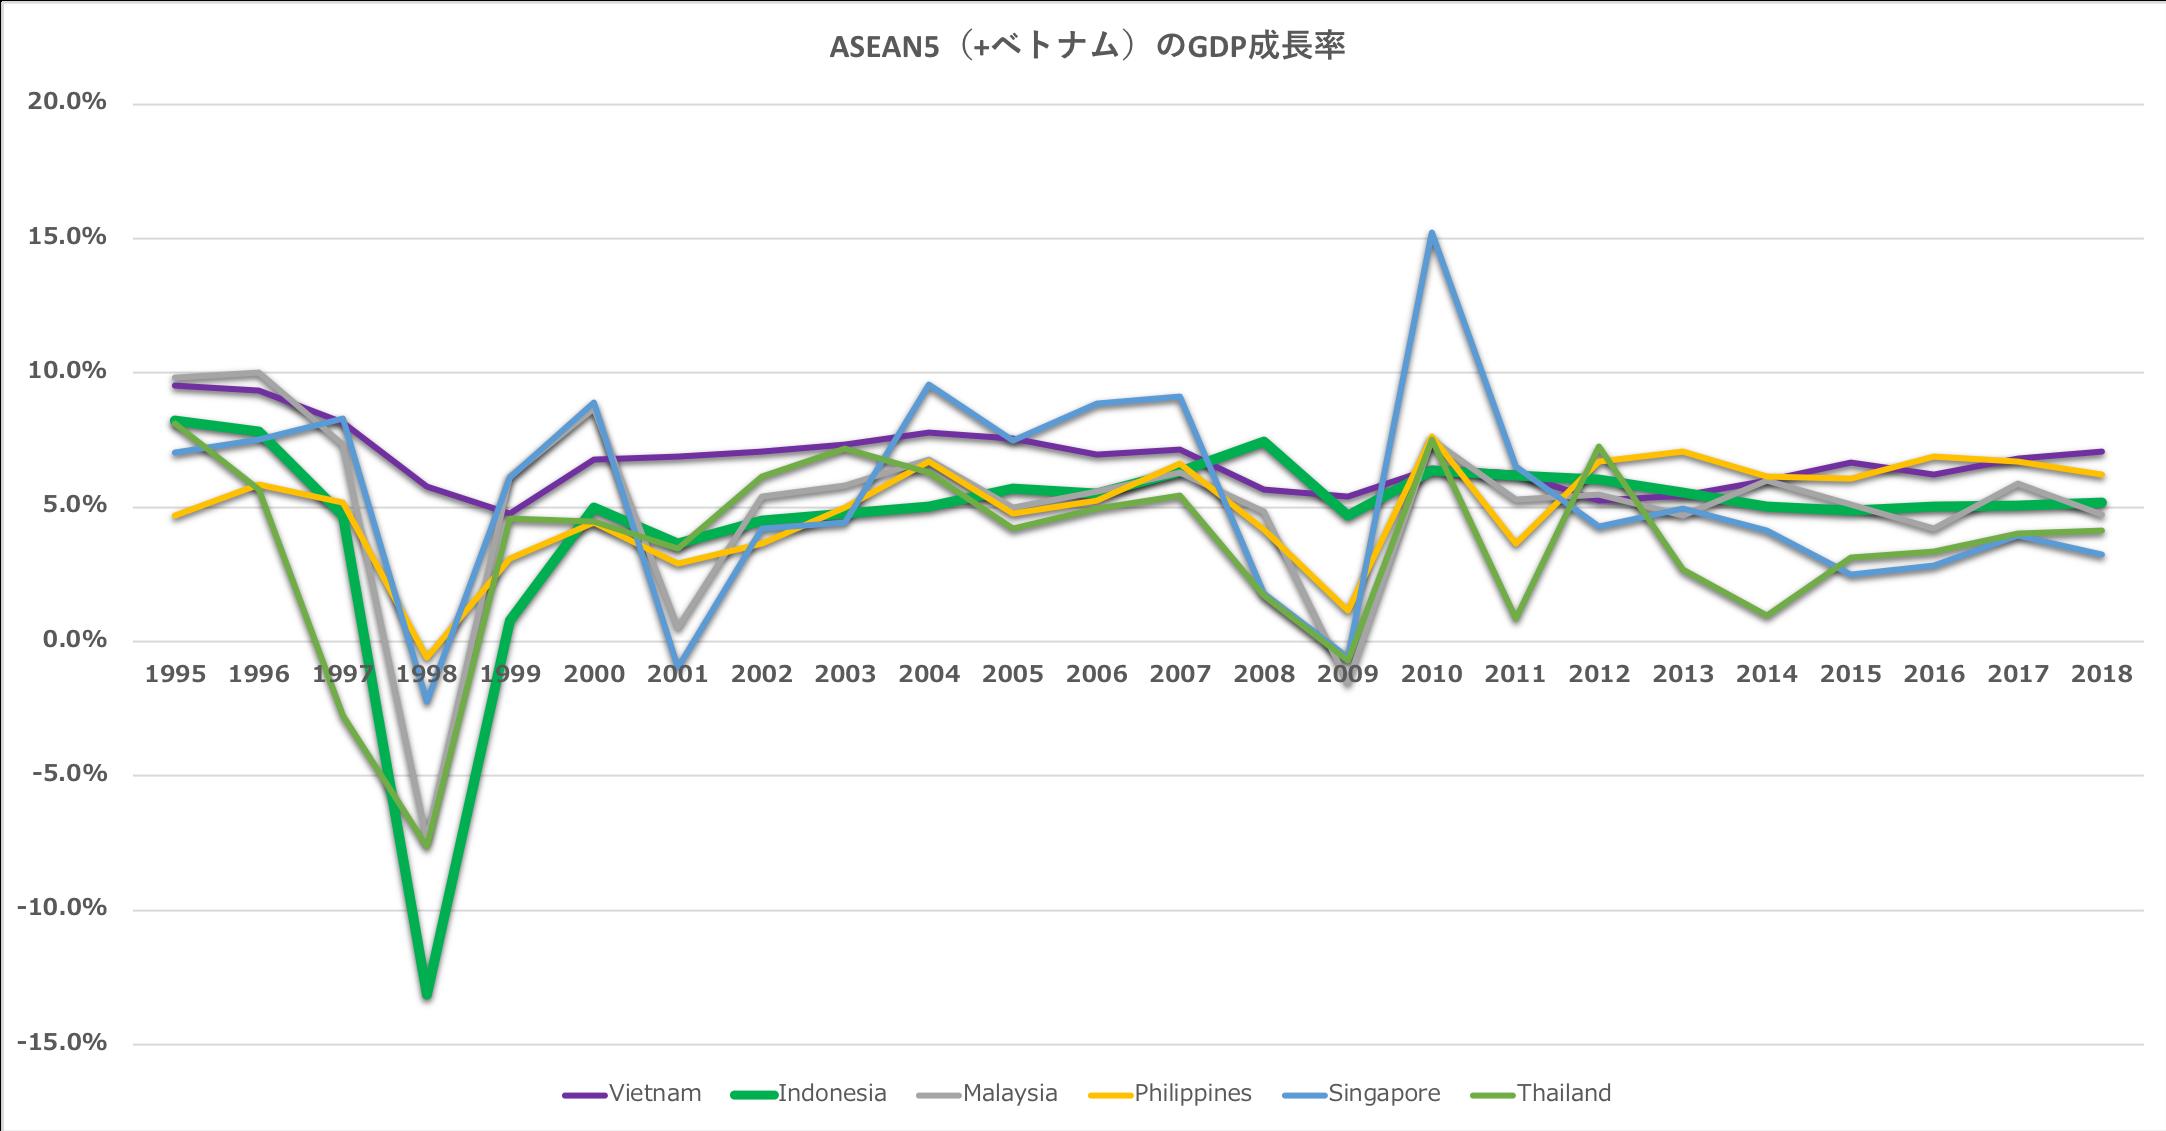 IMF「ASEANのGDP成長率推移」から編集部作成